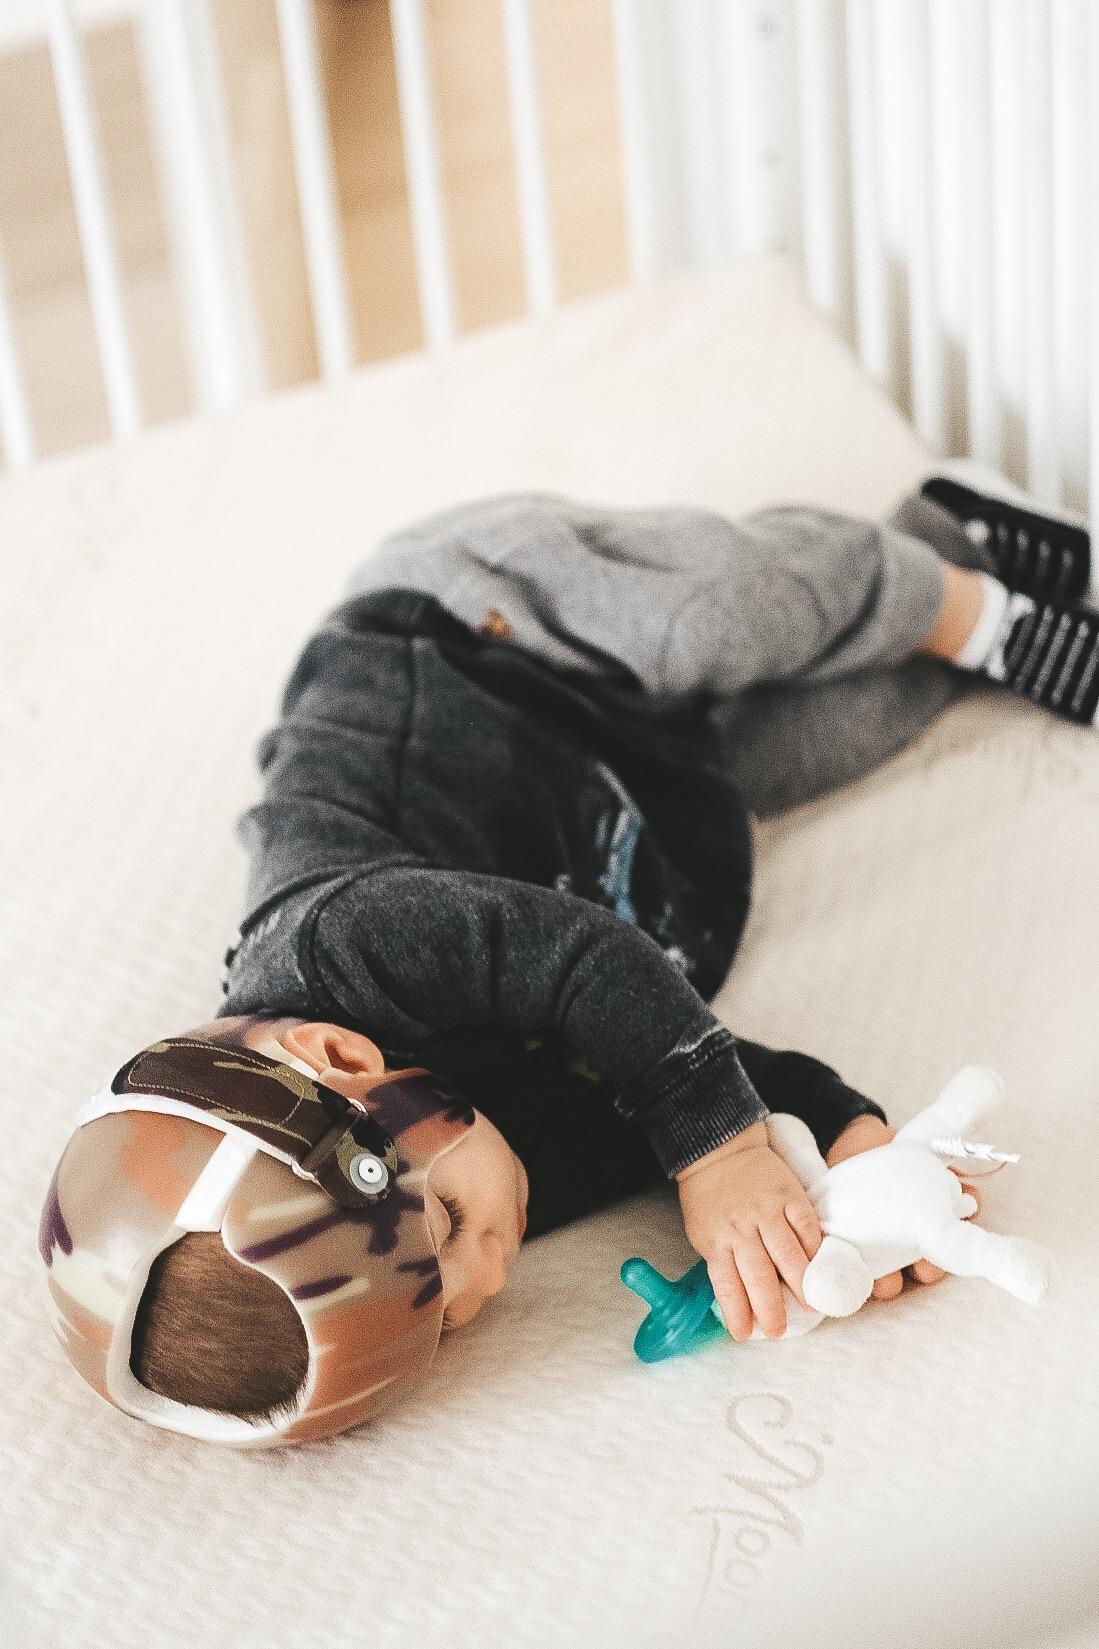 Newborn sleeping tips.  The best baby mattress.  Moonlight slumber baby bluebird crib mattress review.  How to get your newborn to sleep through the night.